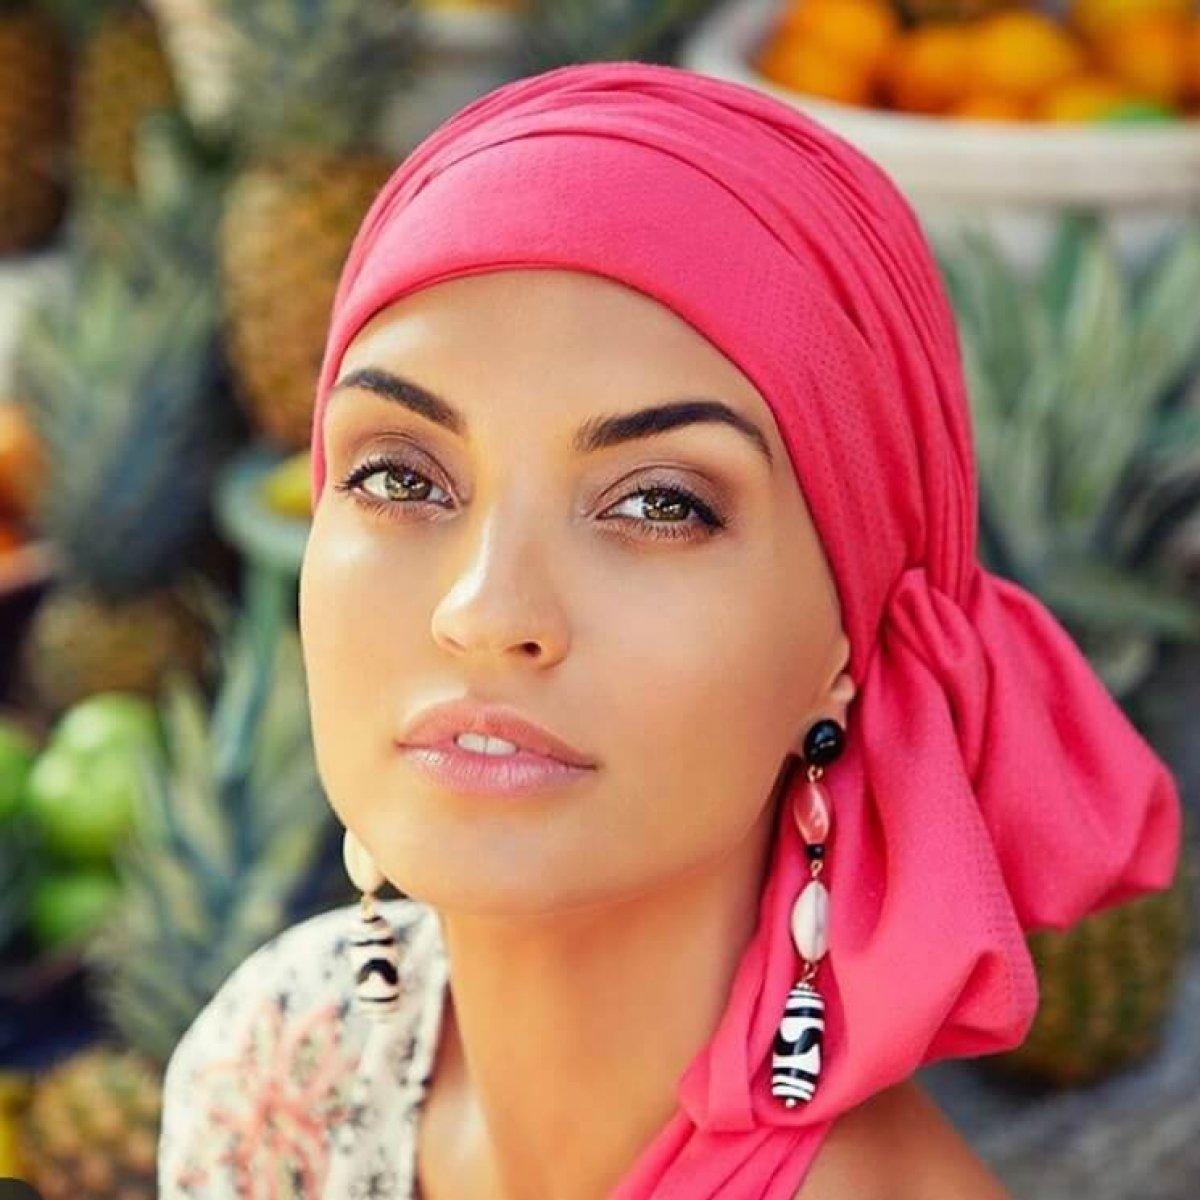 turban chimiotherapie rose fushia